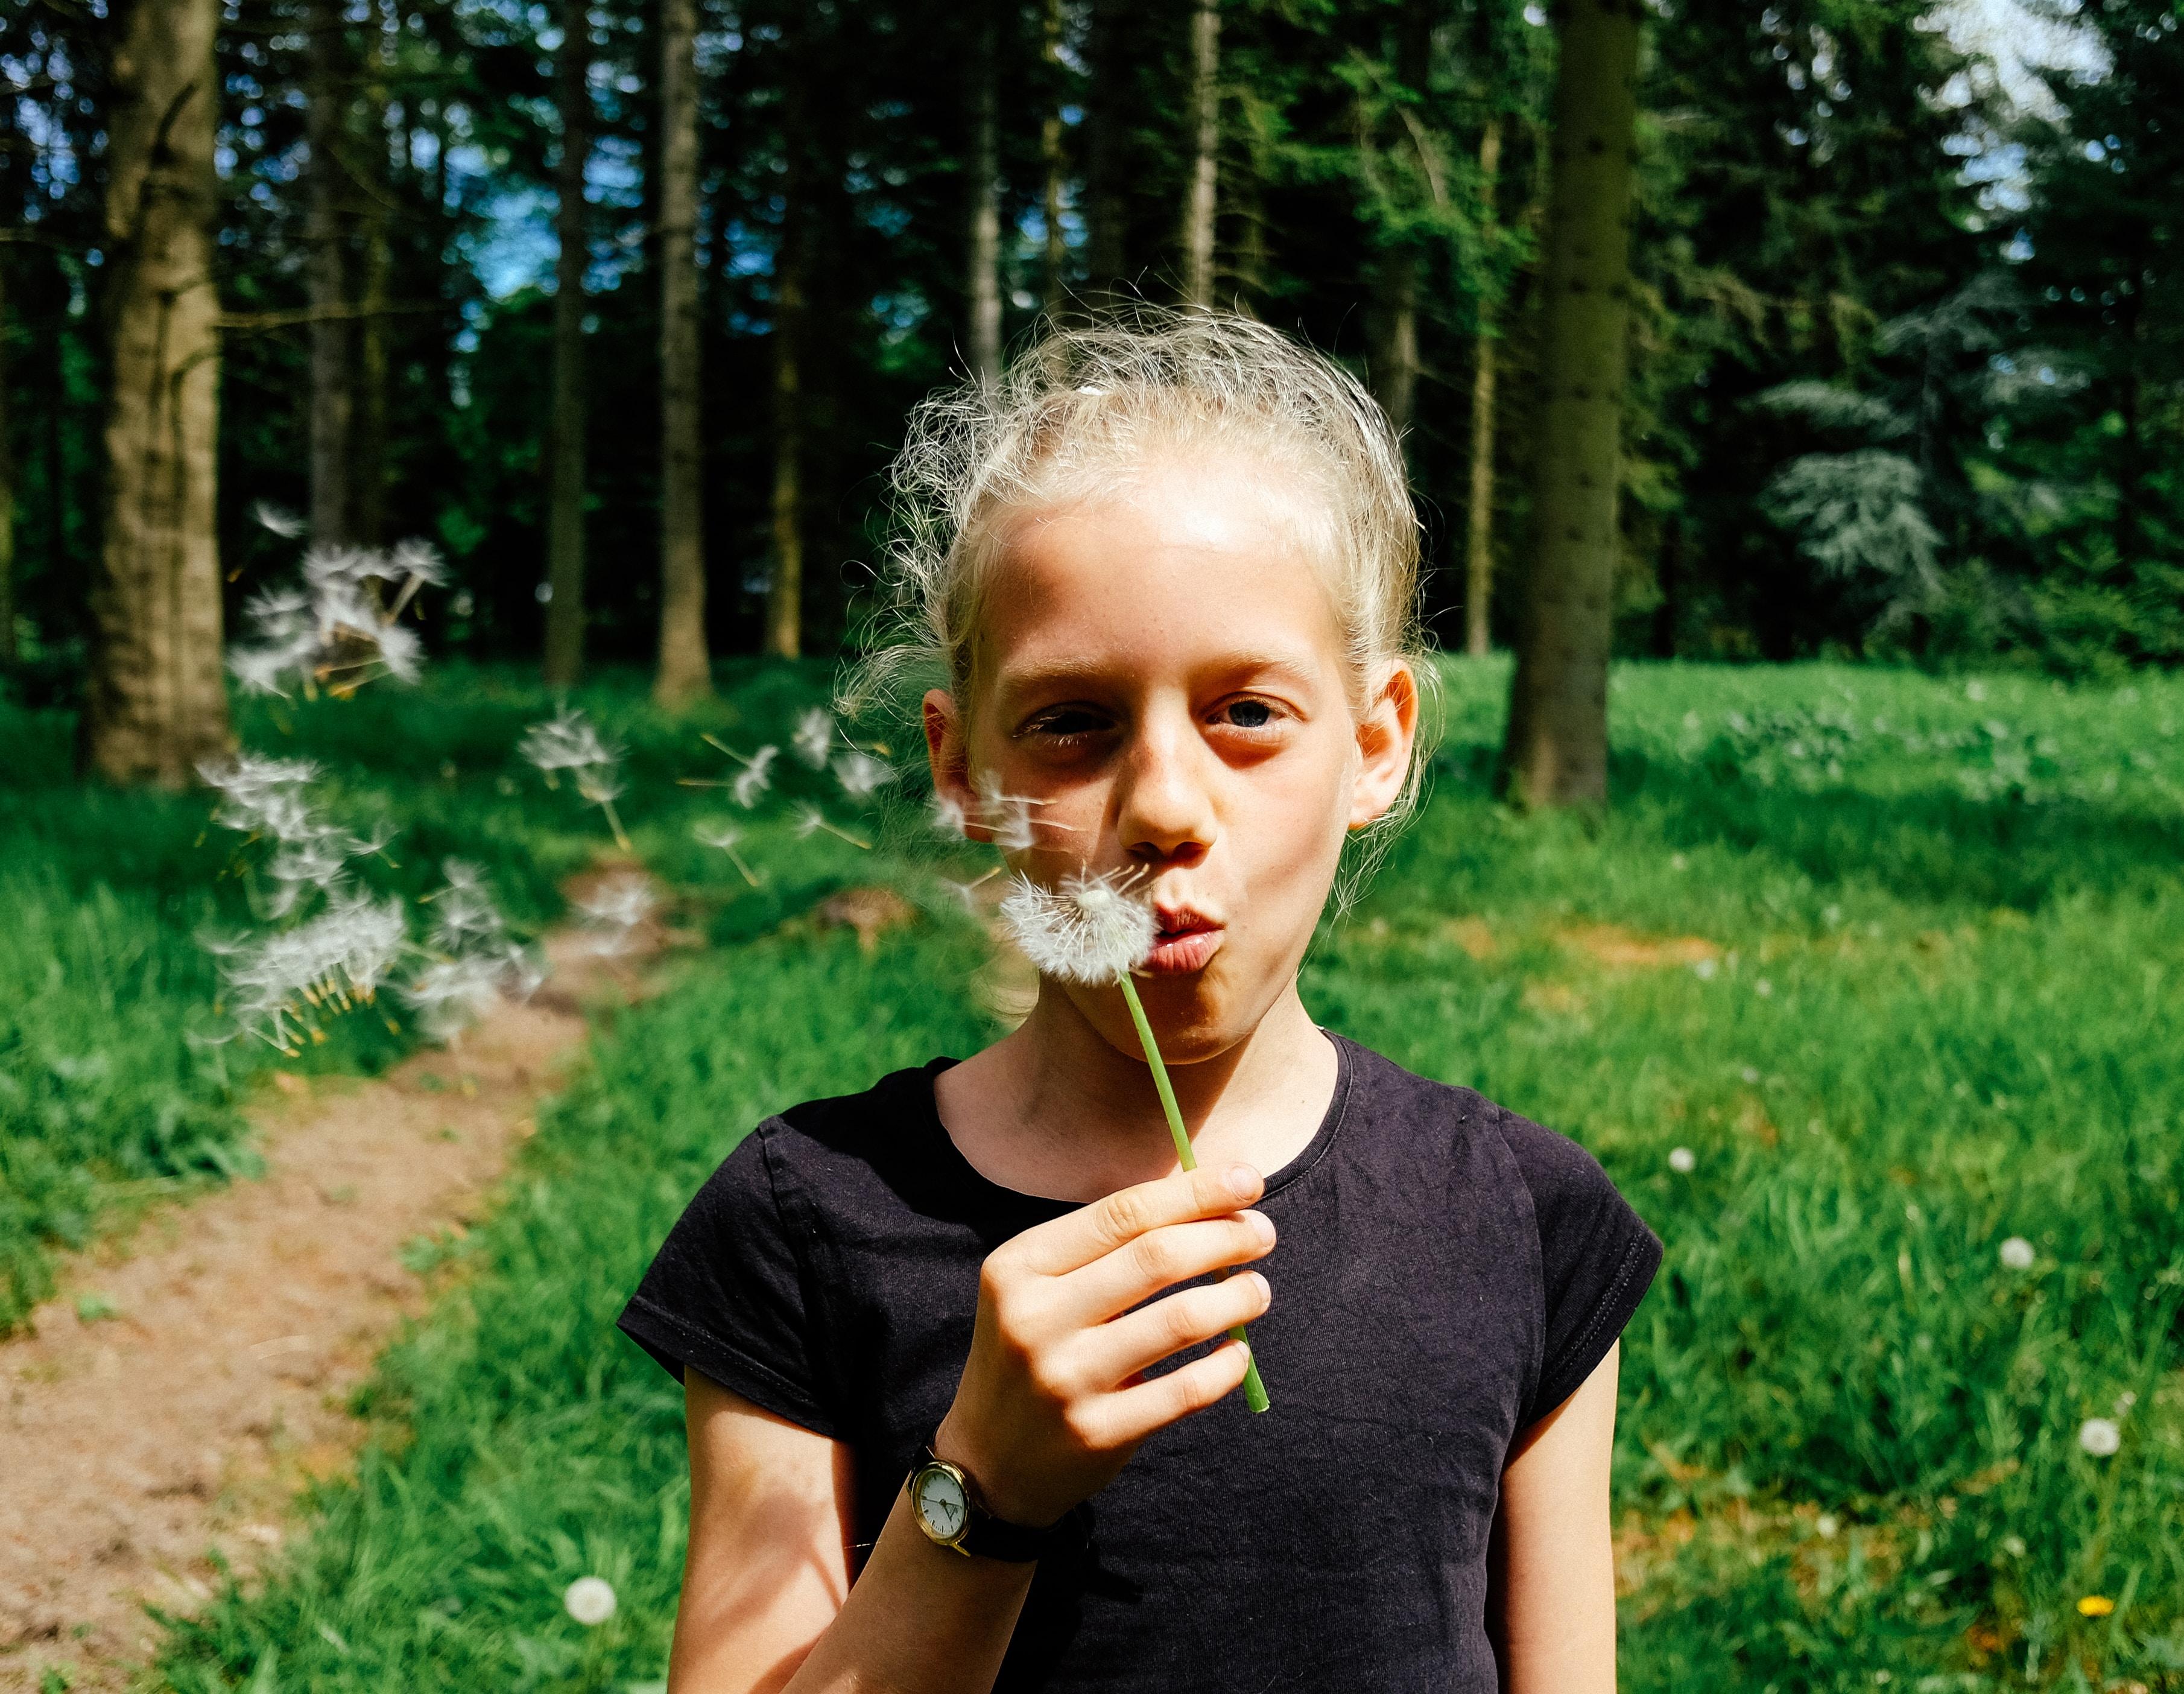 woman in black shirt blowing dandelion